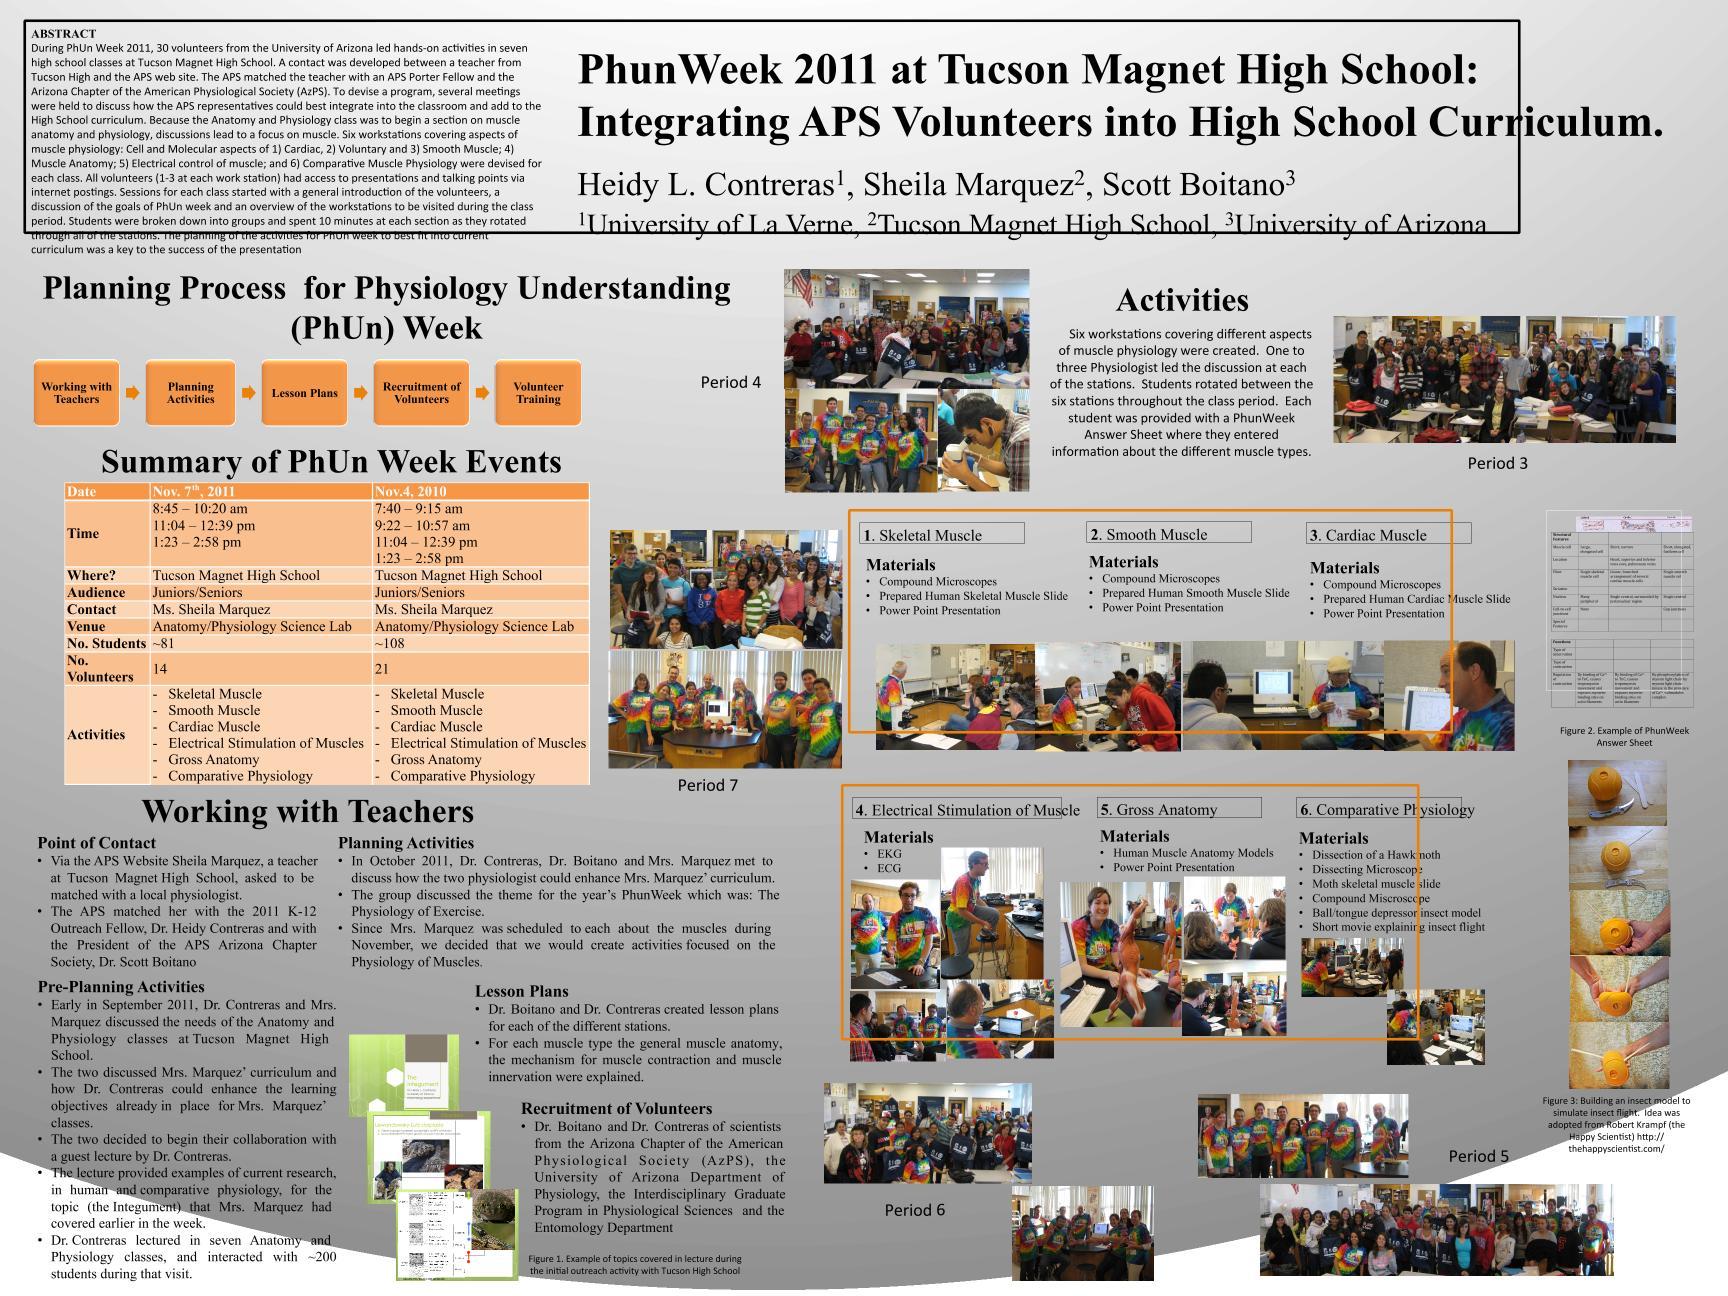 Lifescitrc Phunweek 2011 At Tucson Magnet High School